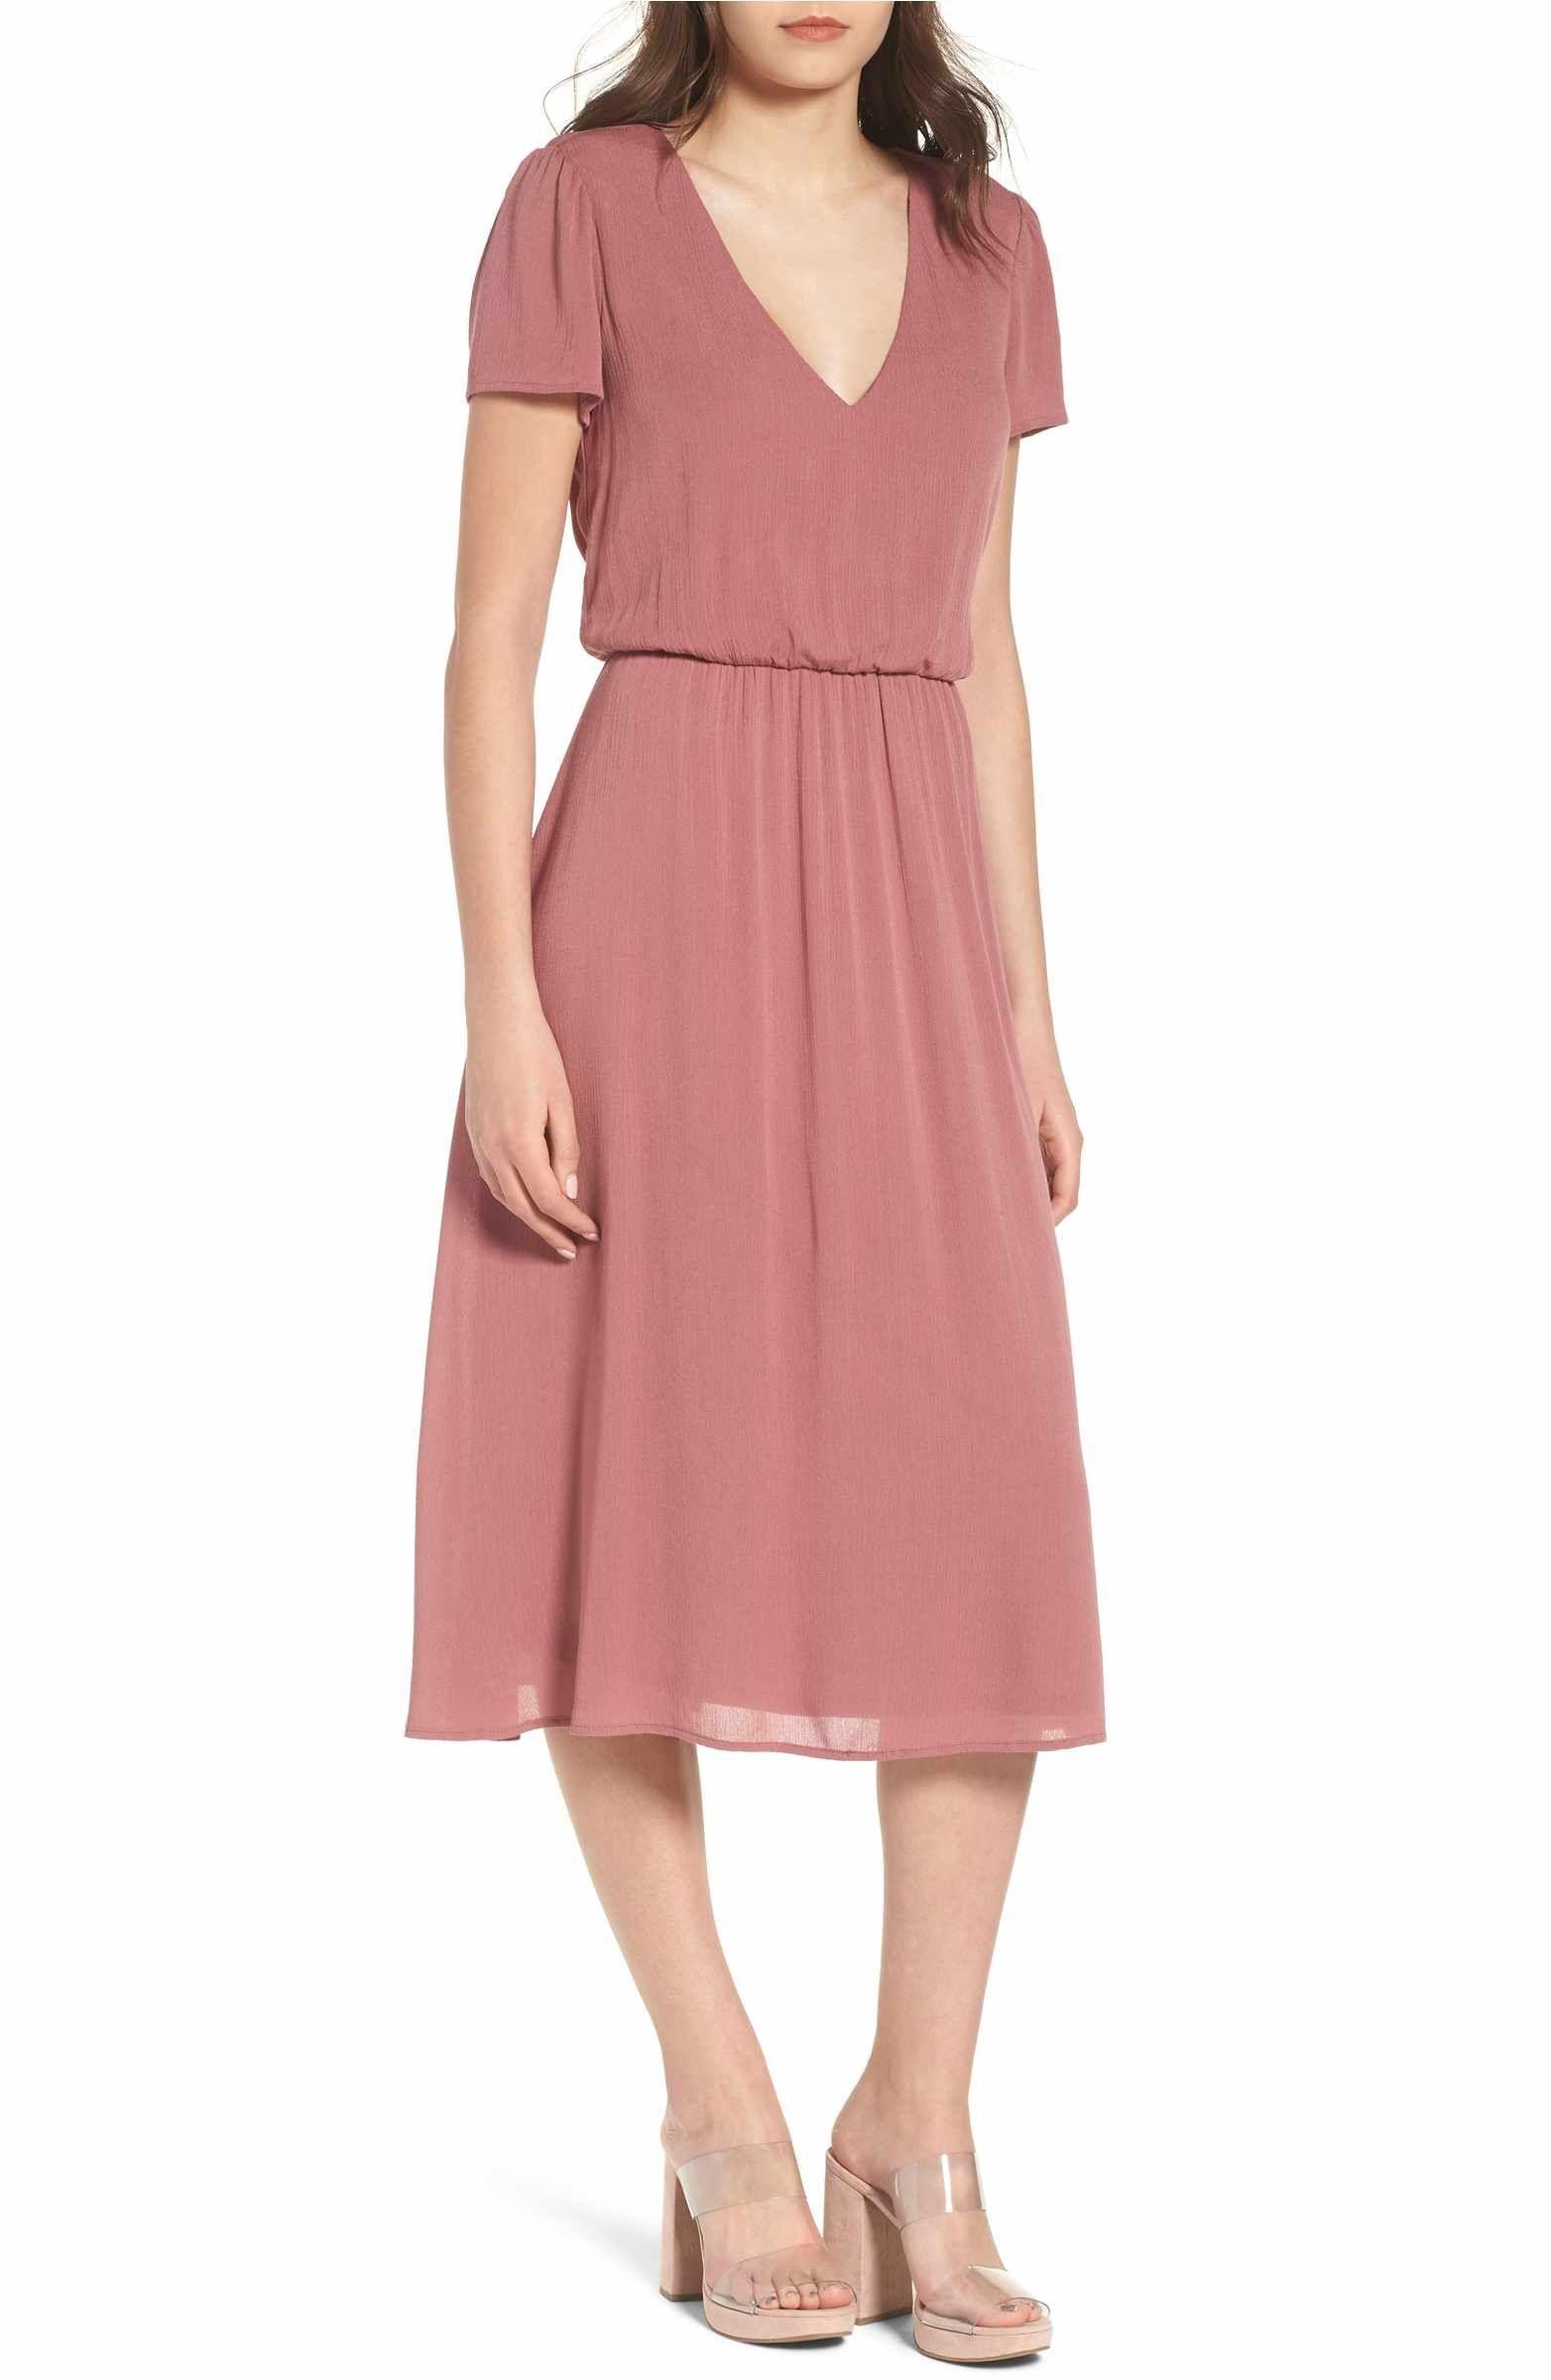 53bfacea88eb Main Image - WAYF Blouson Midi Dress